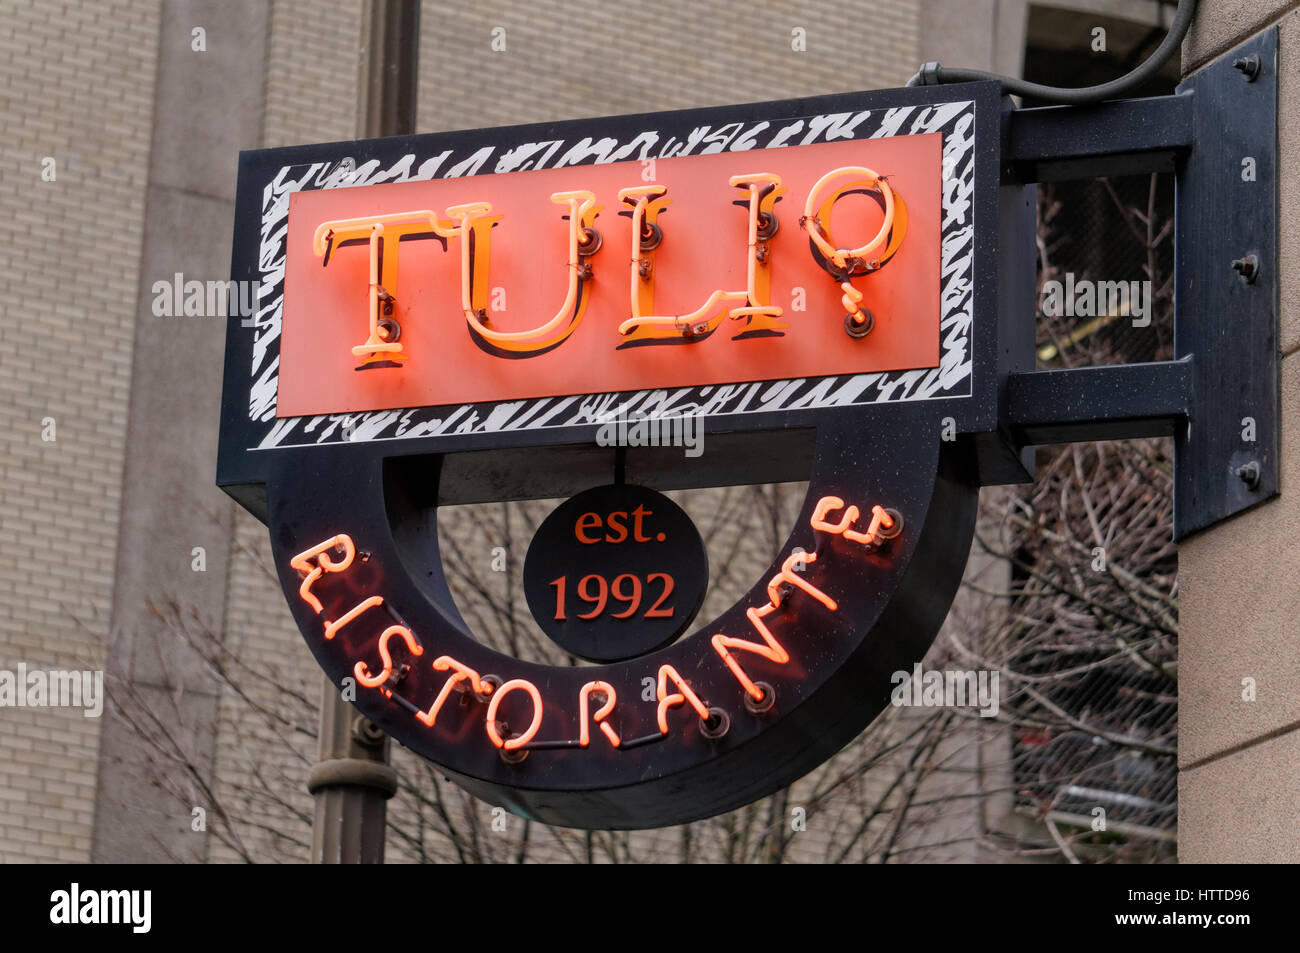 Tulio Ristorante upscale Italian restaurant neon sign  in downtown Seattle, Washington, USA - Stock Image